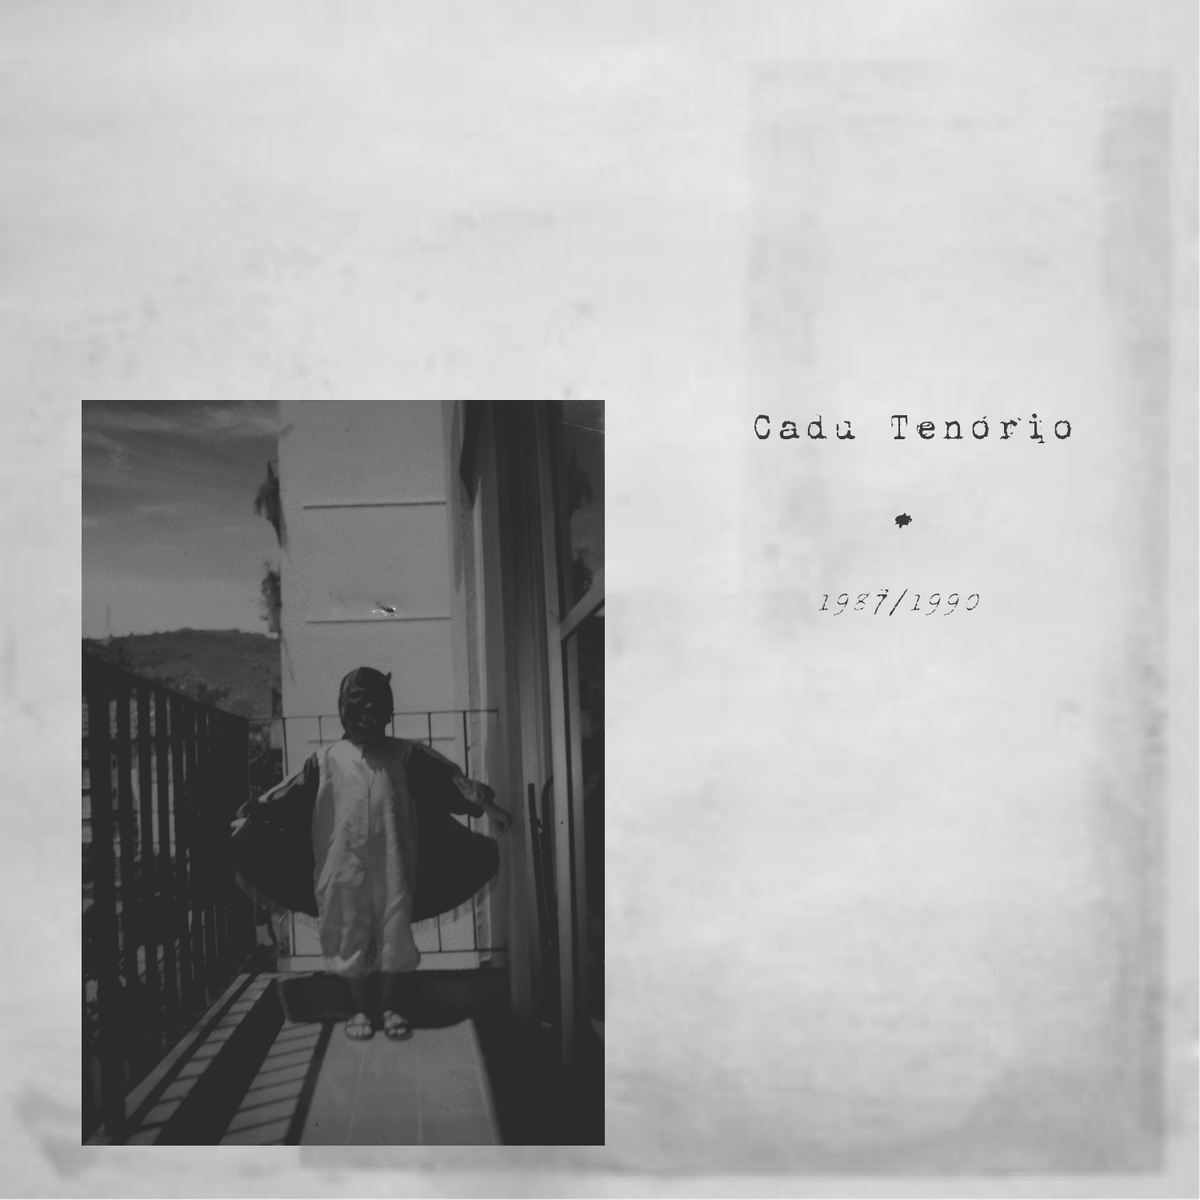 CaduTenorio_1987_1990